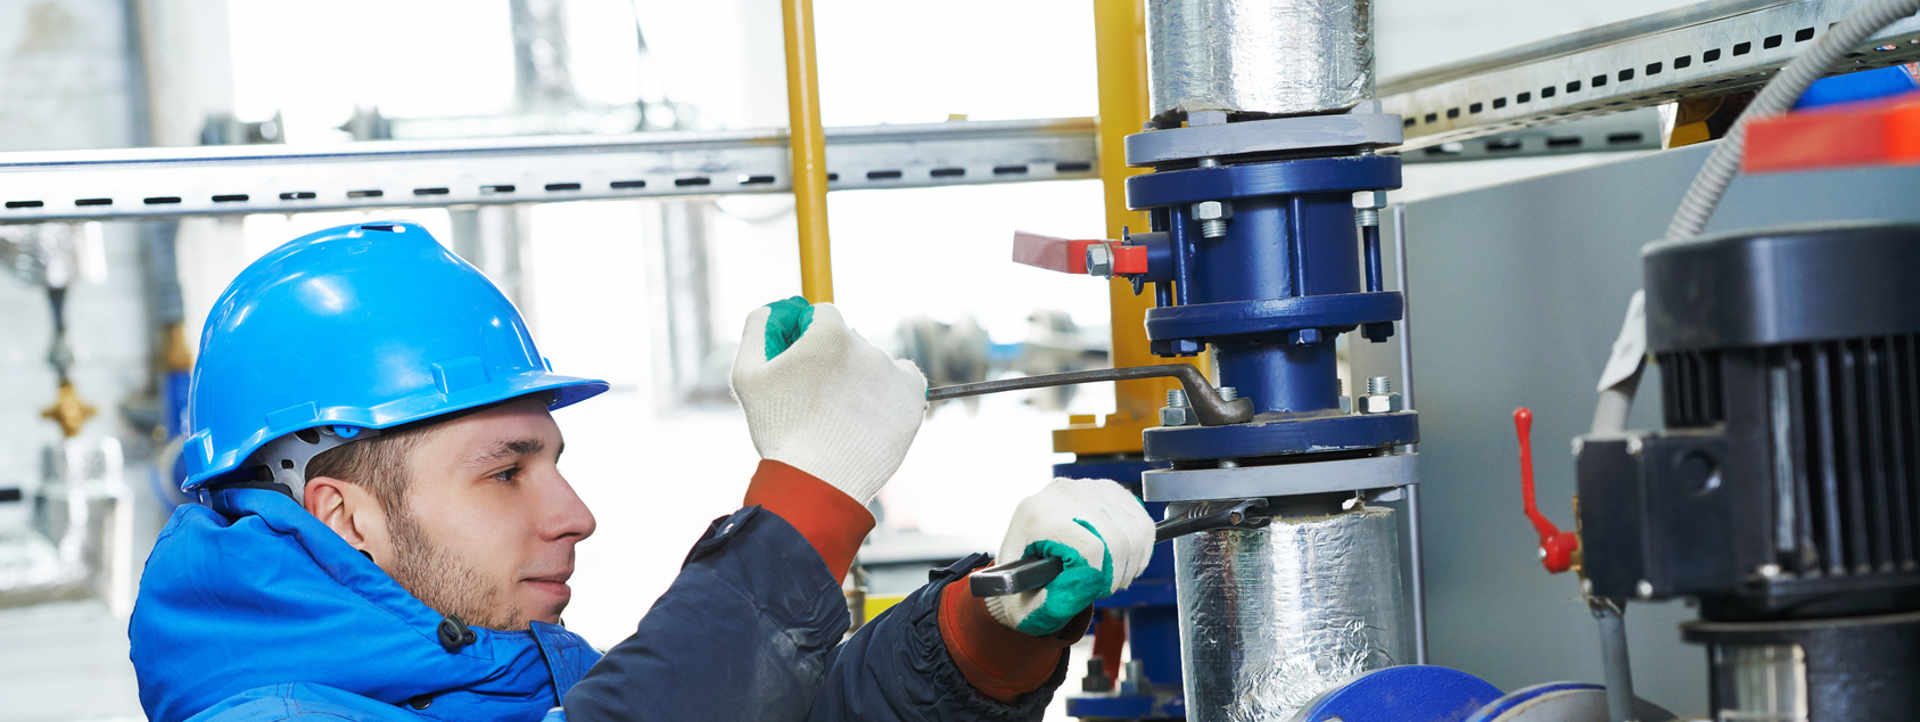 Emploi Maintenance Industrielle Cv Offres Recrutement